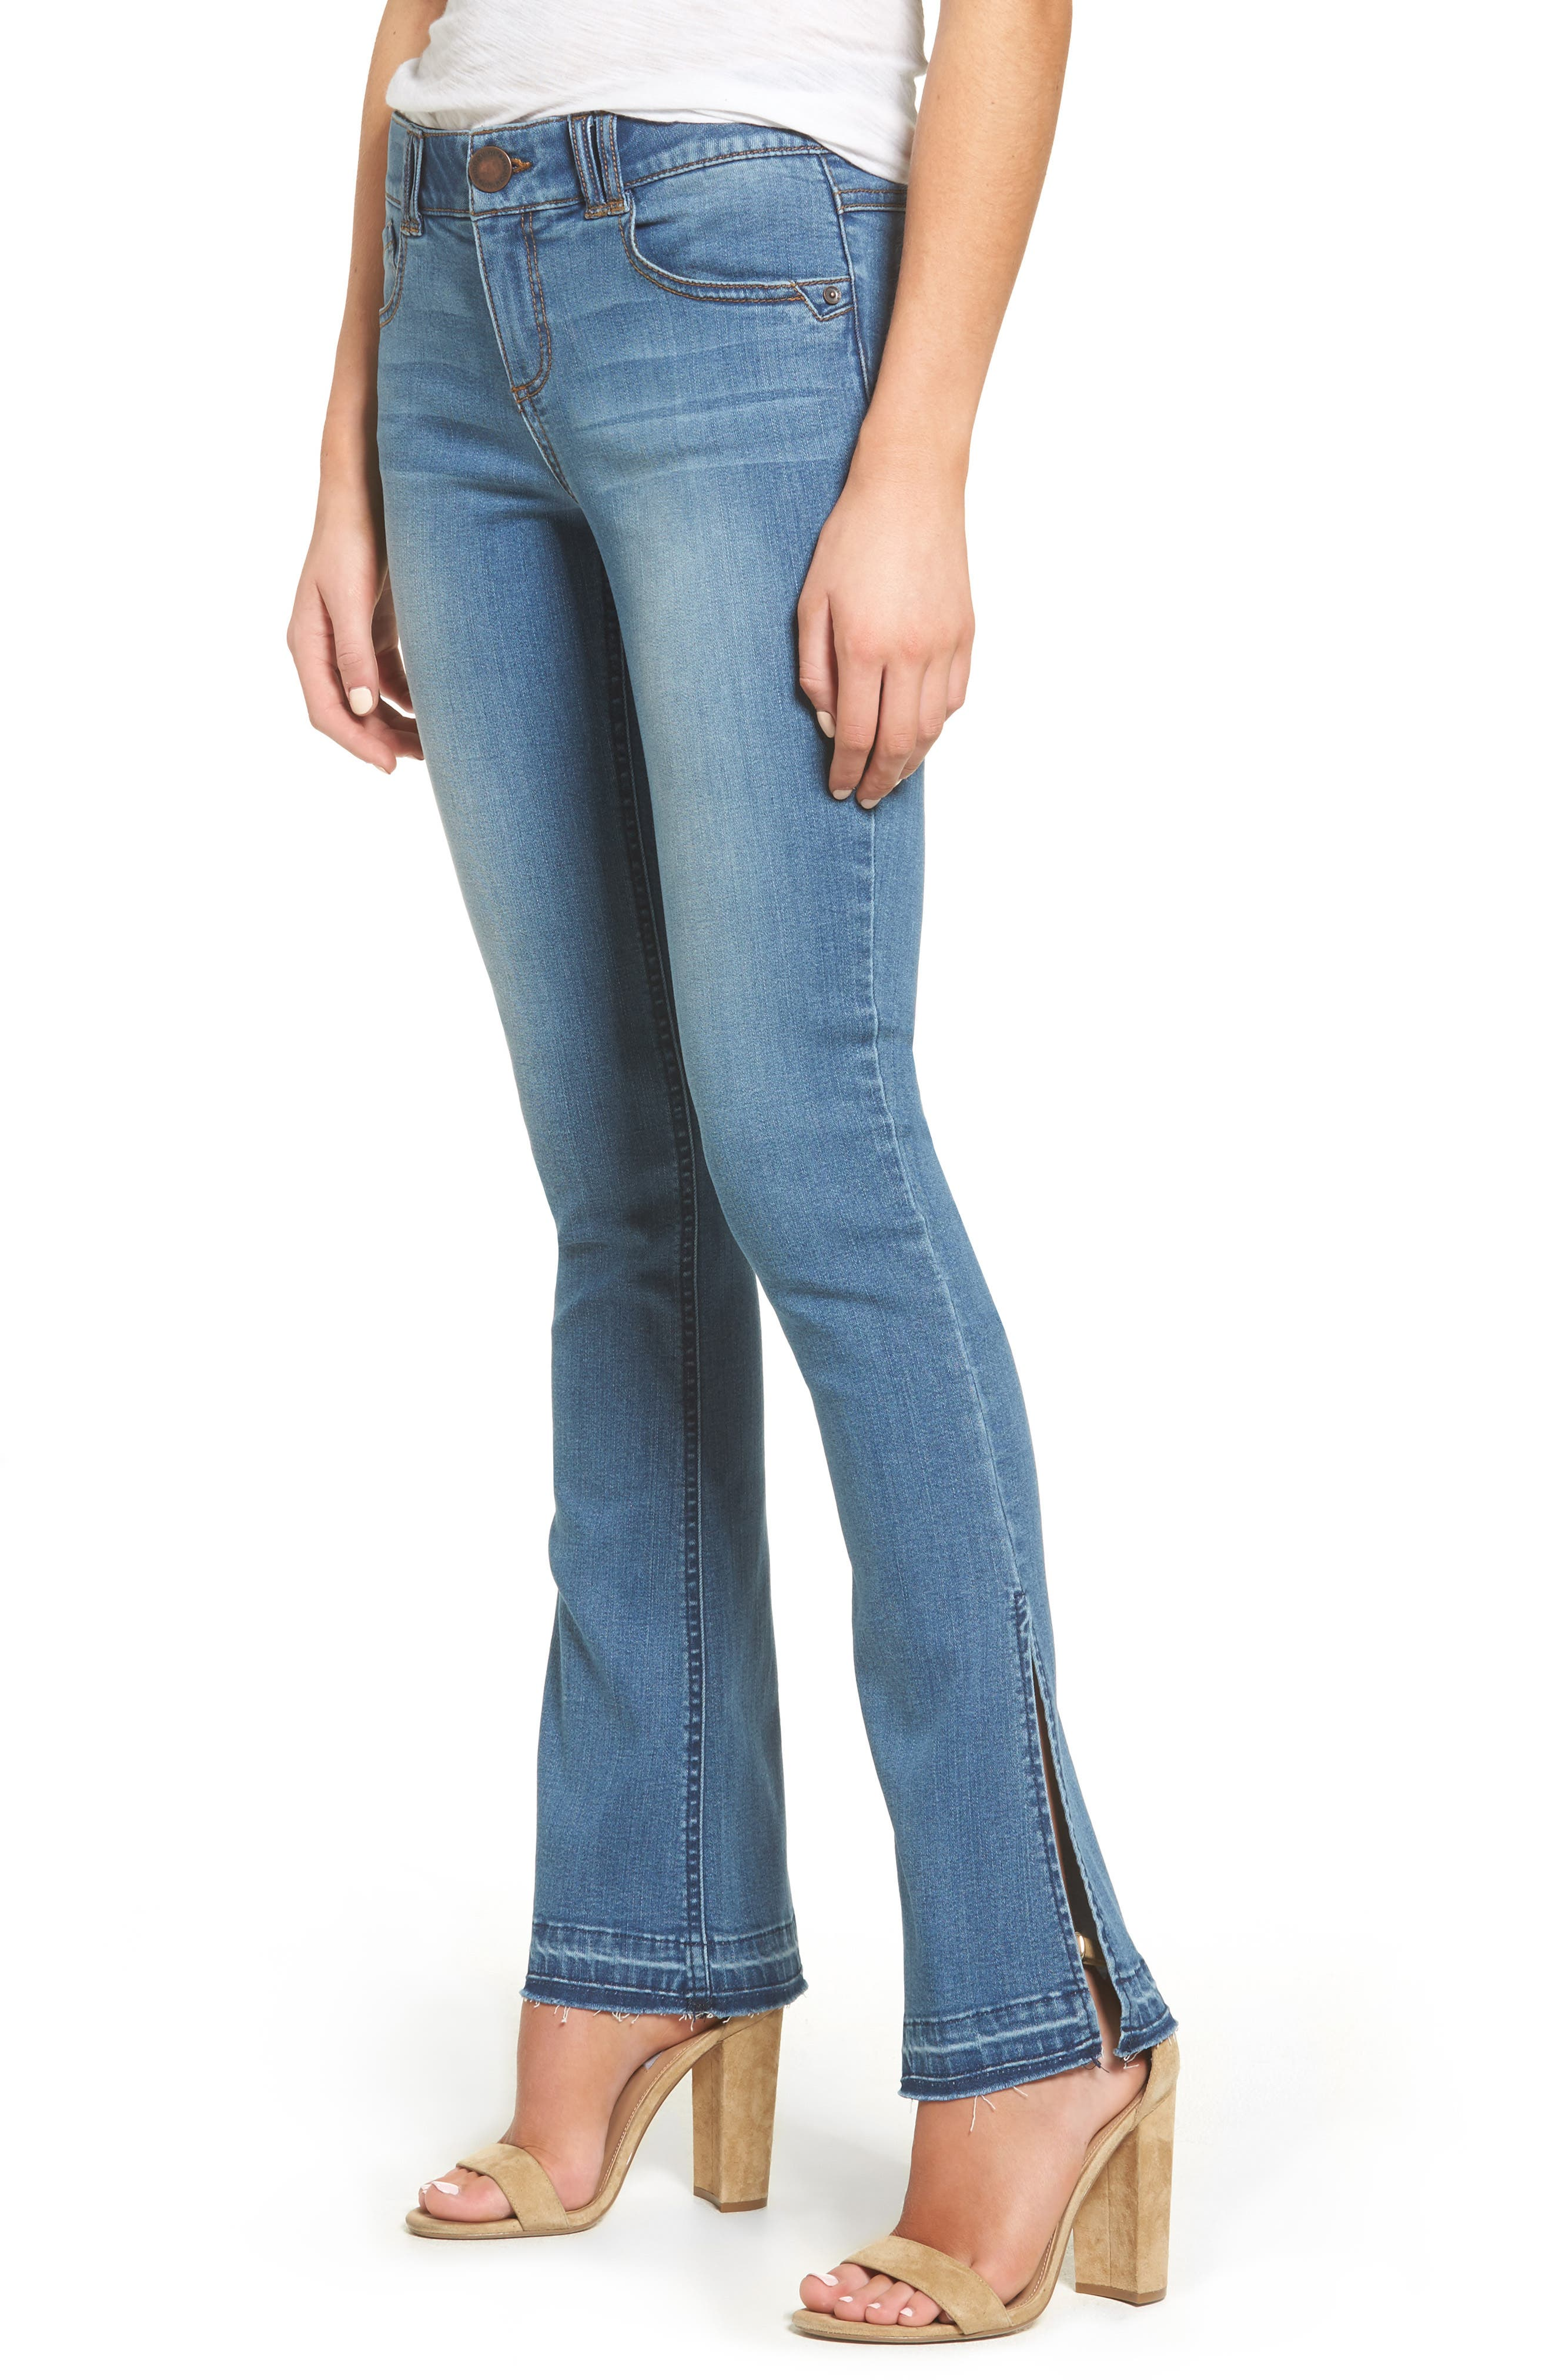 Alternate Image 1 Selected - Wit & Wisdom Ab-solution Split Release Hem Jeans (Regular & Petite) (Nordstrom Exclusive)